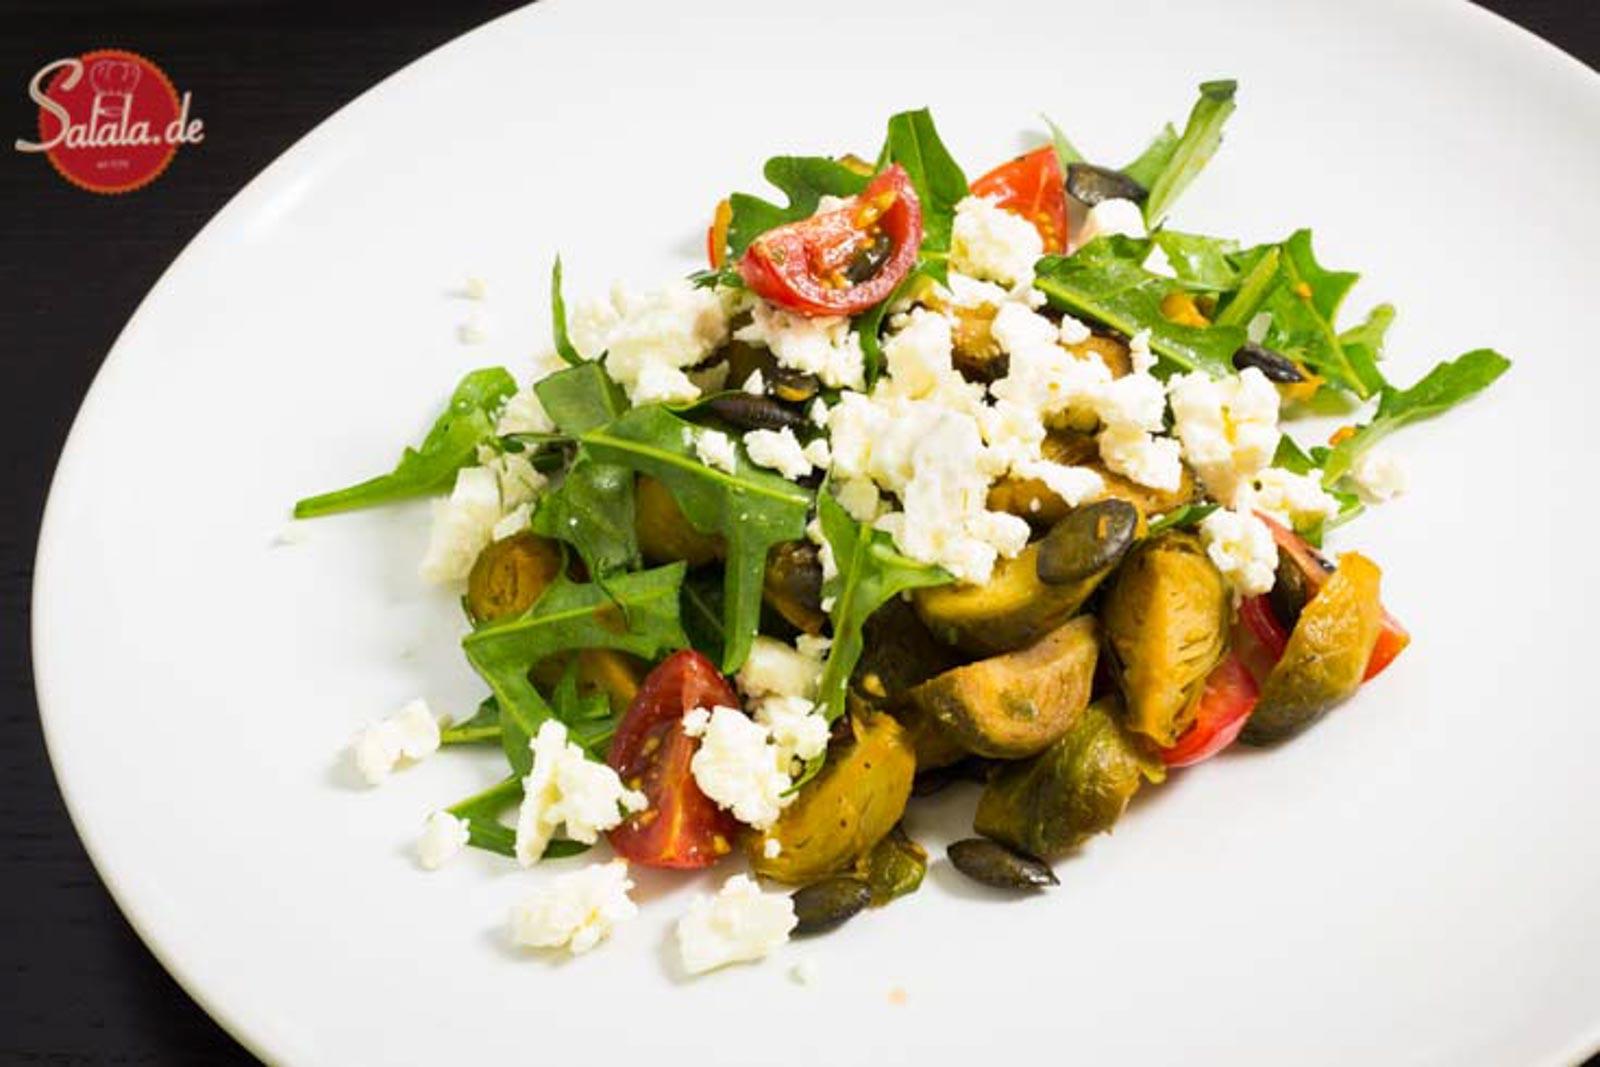 Gerösteter Rosenkohlsalat mit Feta und Rucola Rezept Low Carb Salat salala.de